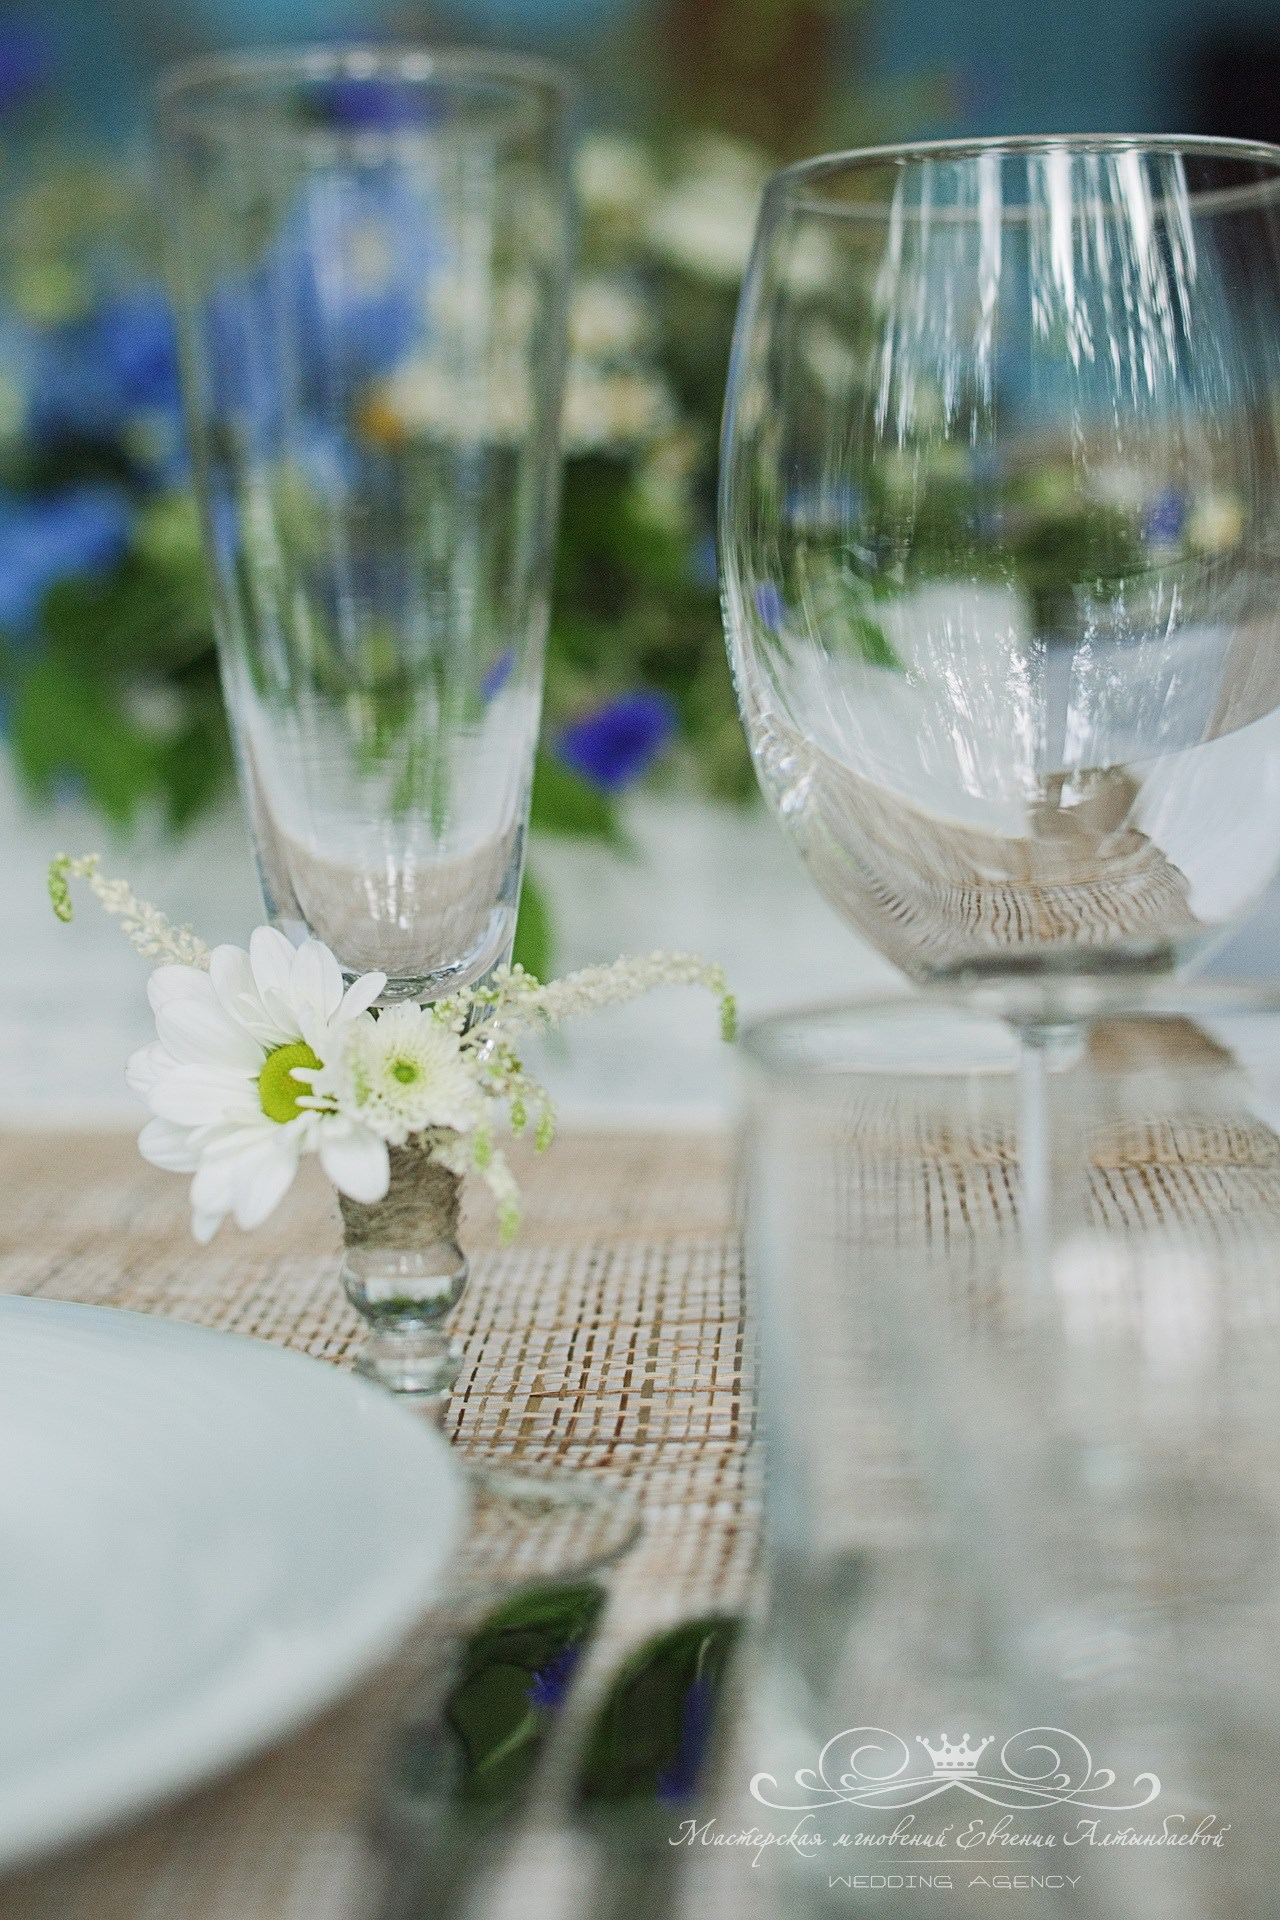 dekor-svadebnyh-bokalov-zhivymi-tsvetami